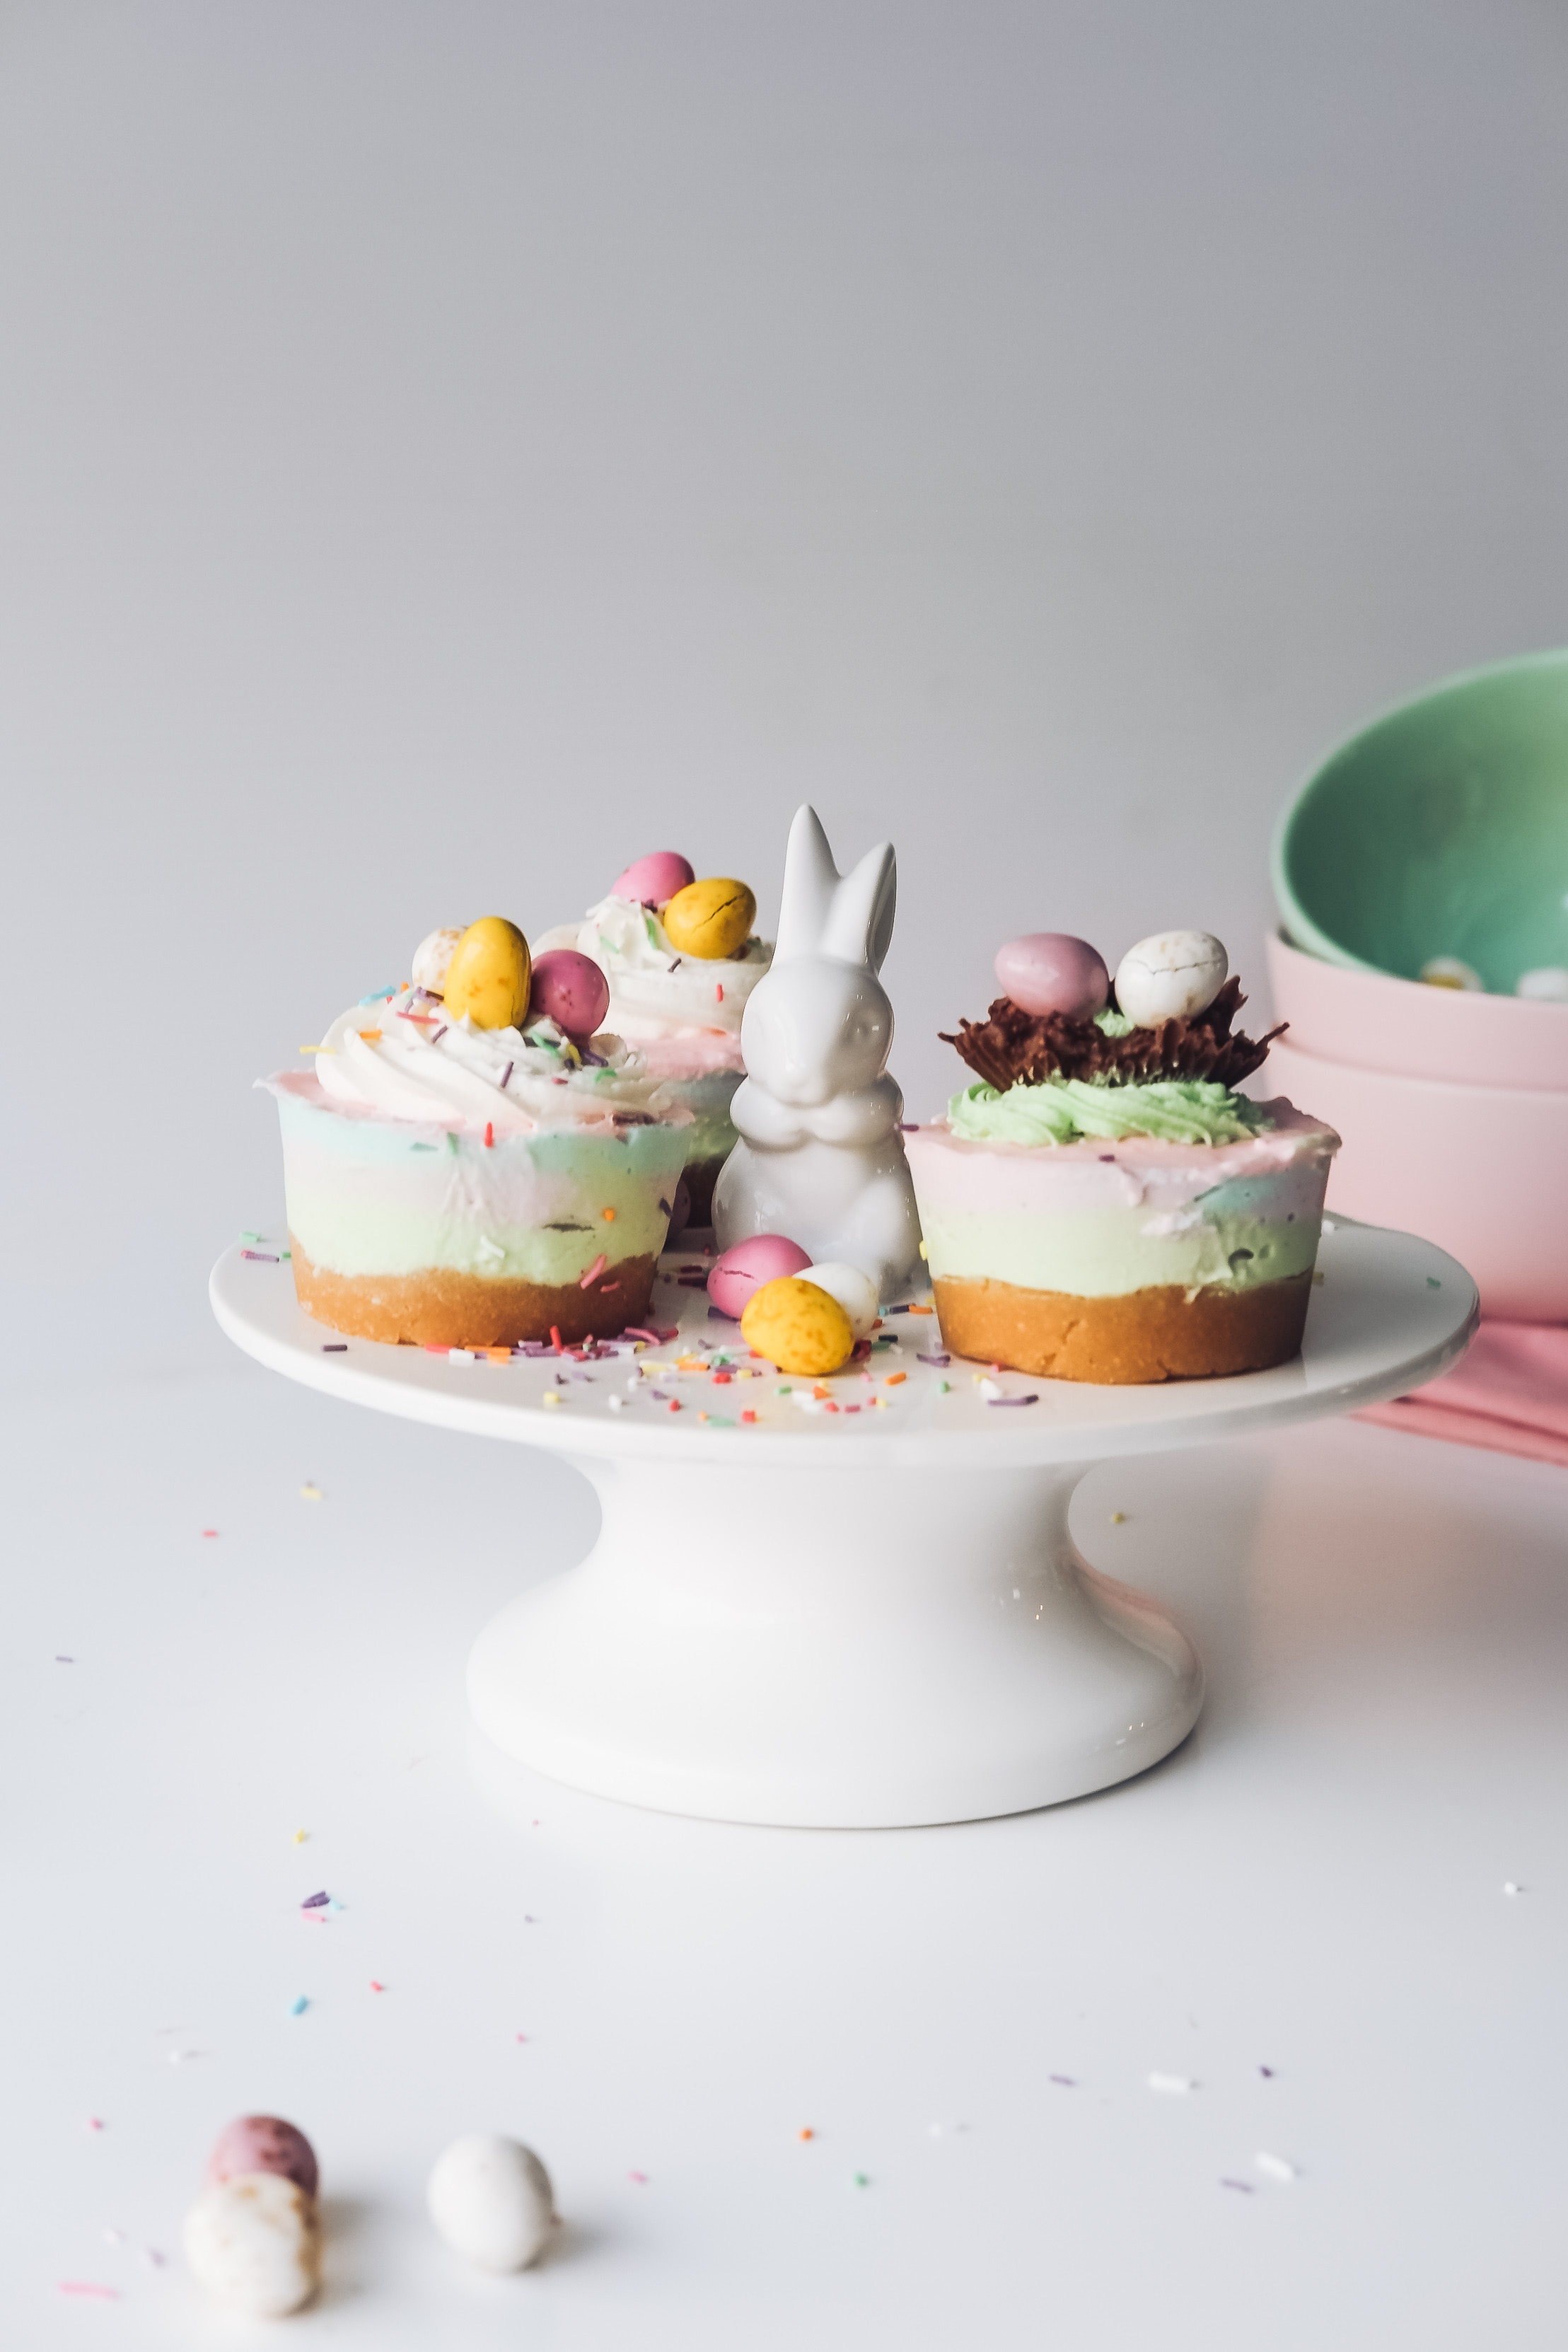 Birds nest cupcakes for Easter